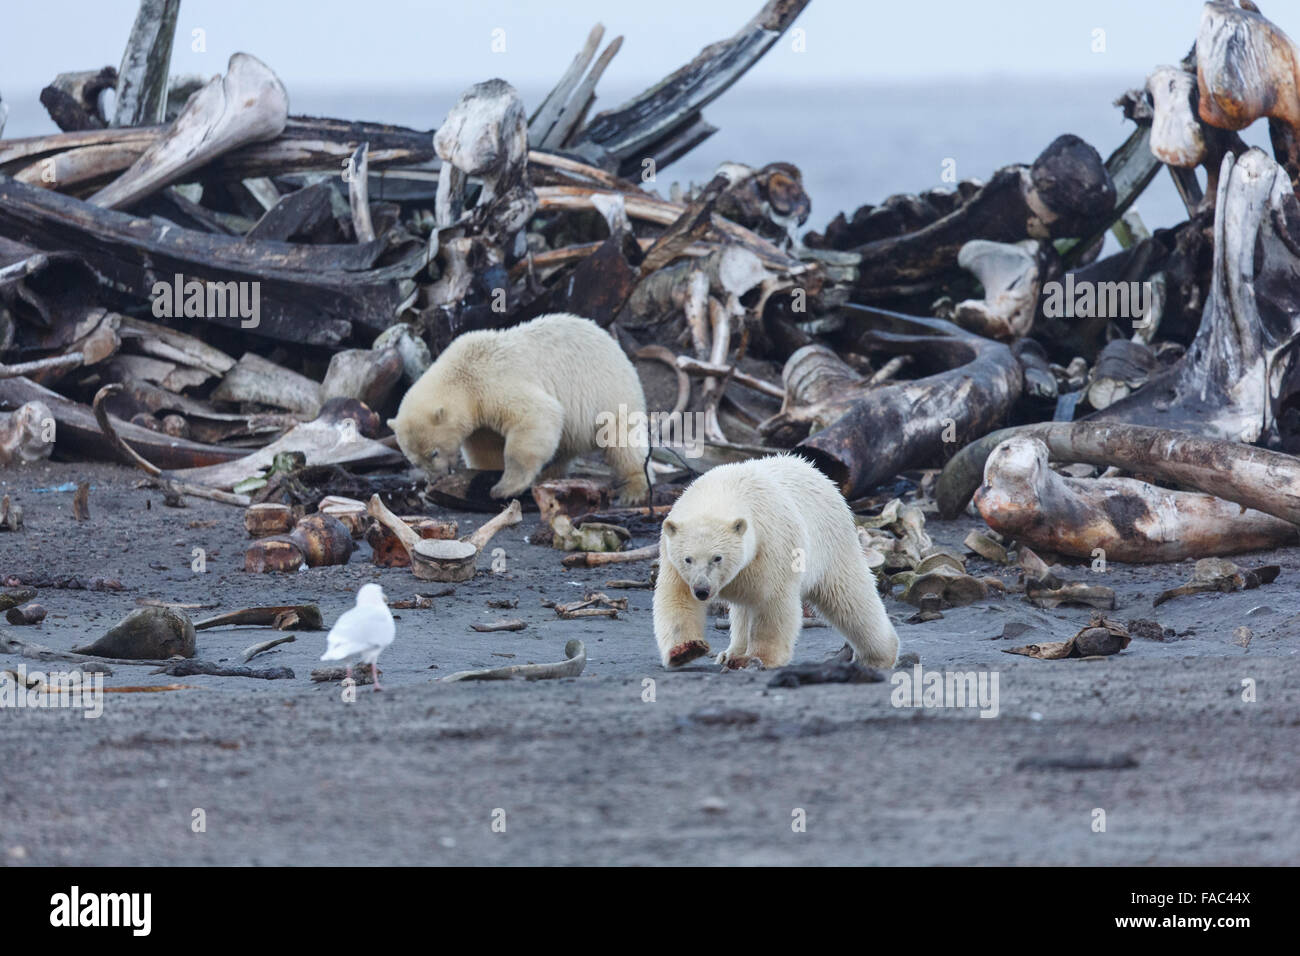 Polar bears (Ursus maritimus) at a whale bone pile,  Arctic National Wildlife Refuge, Alaska. - Stock Image